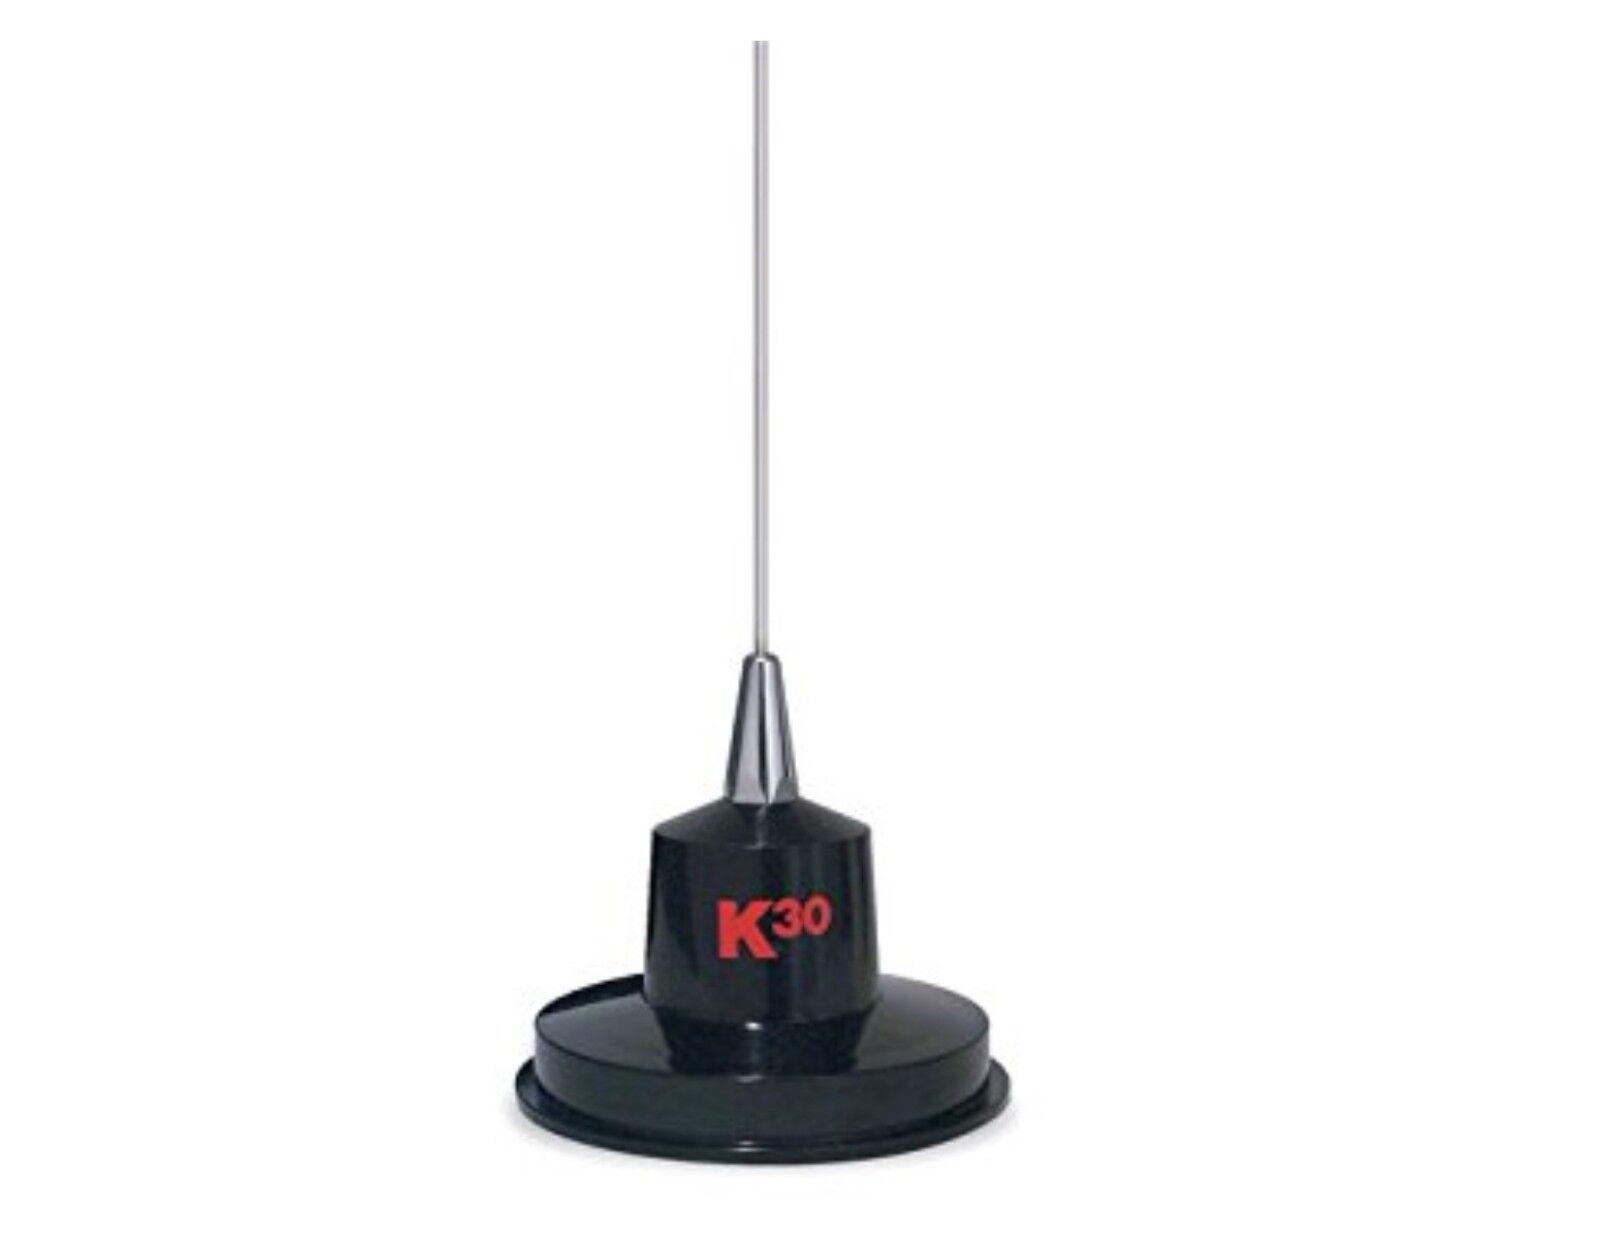 "K40 K30 35"" Magnet Mount Stainless Steel CB Radio Antenna, 3"